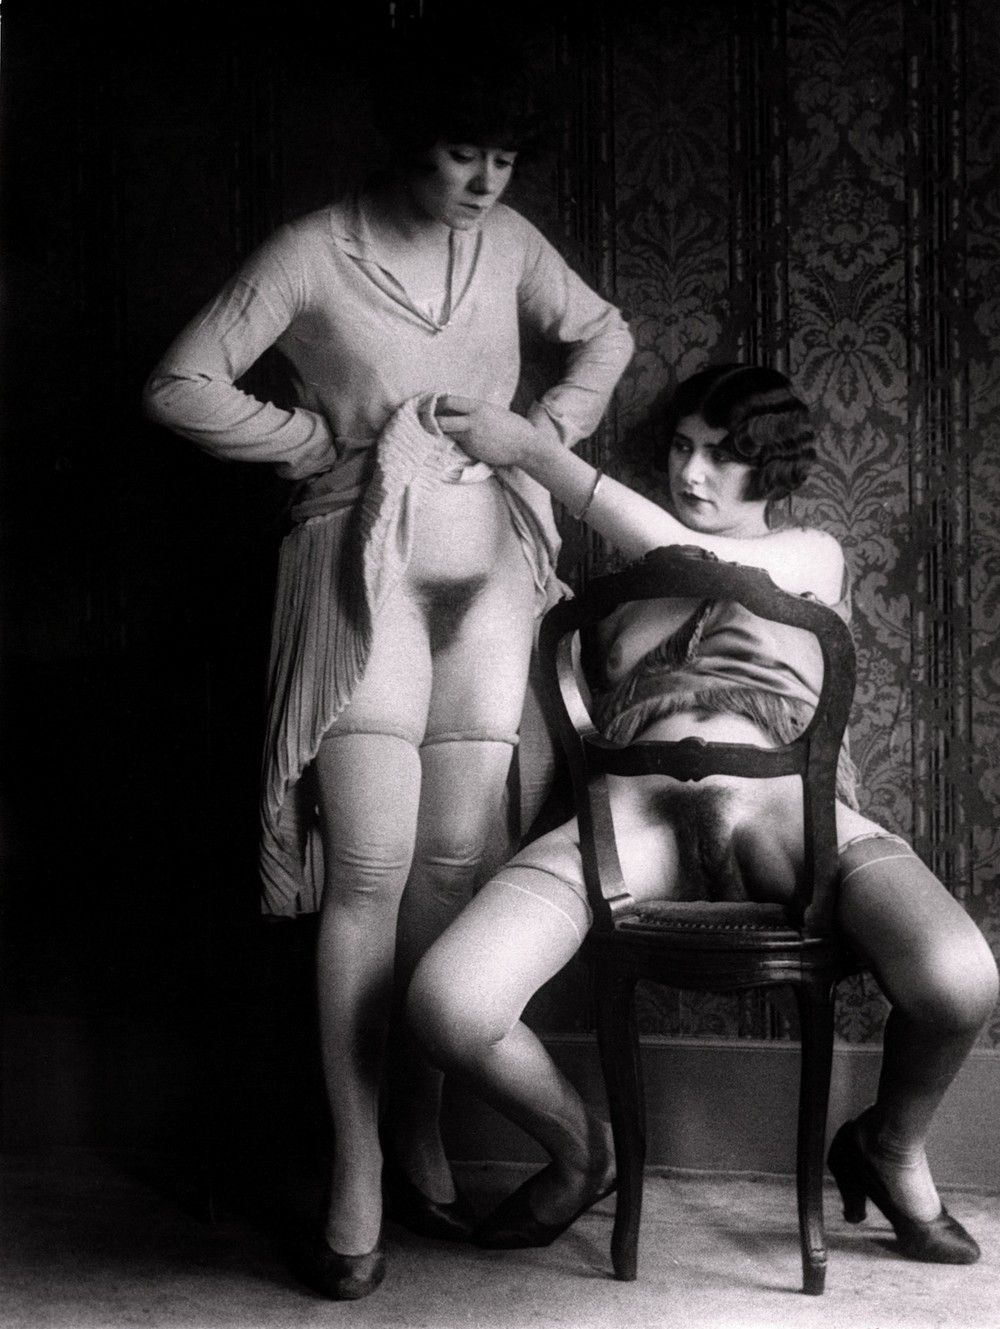 prostitutas mostoles prostitutas de los años